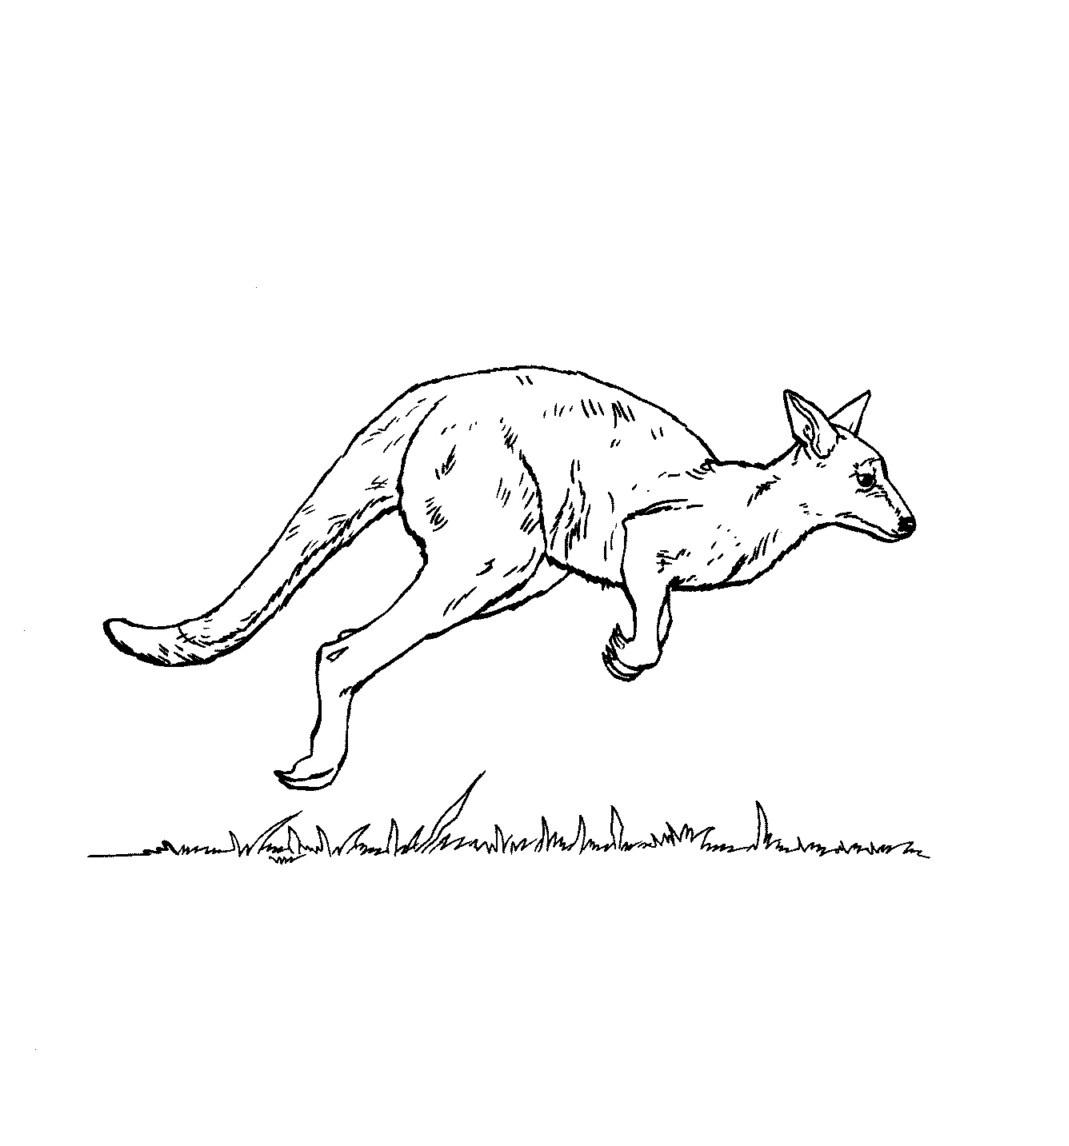 Free Printable Kangaroo Coloring Pages For Kids